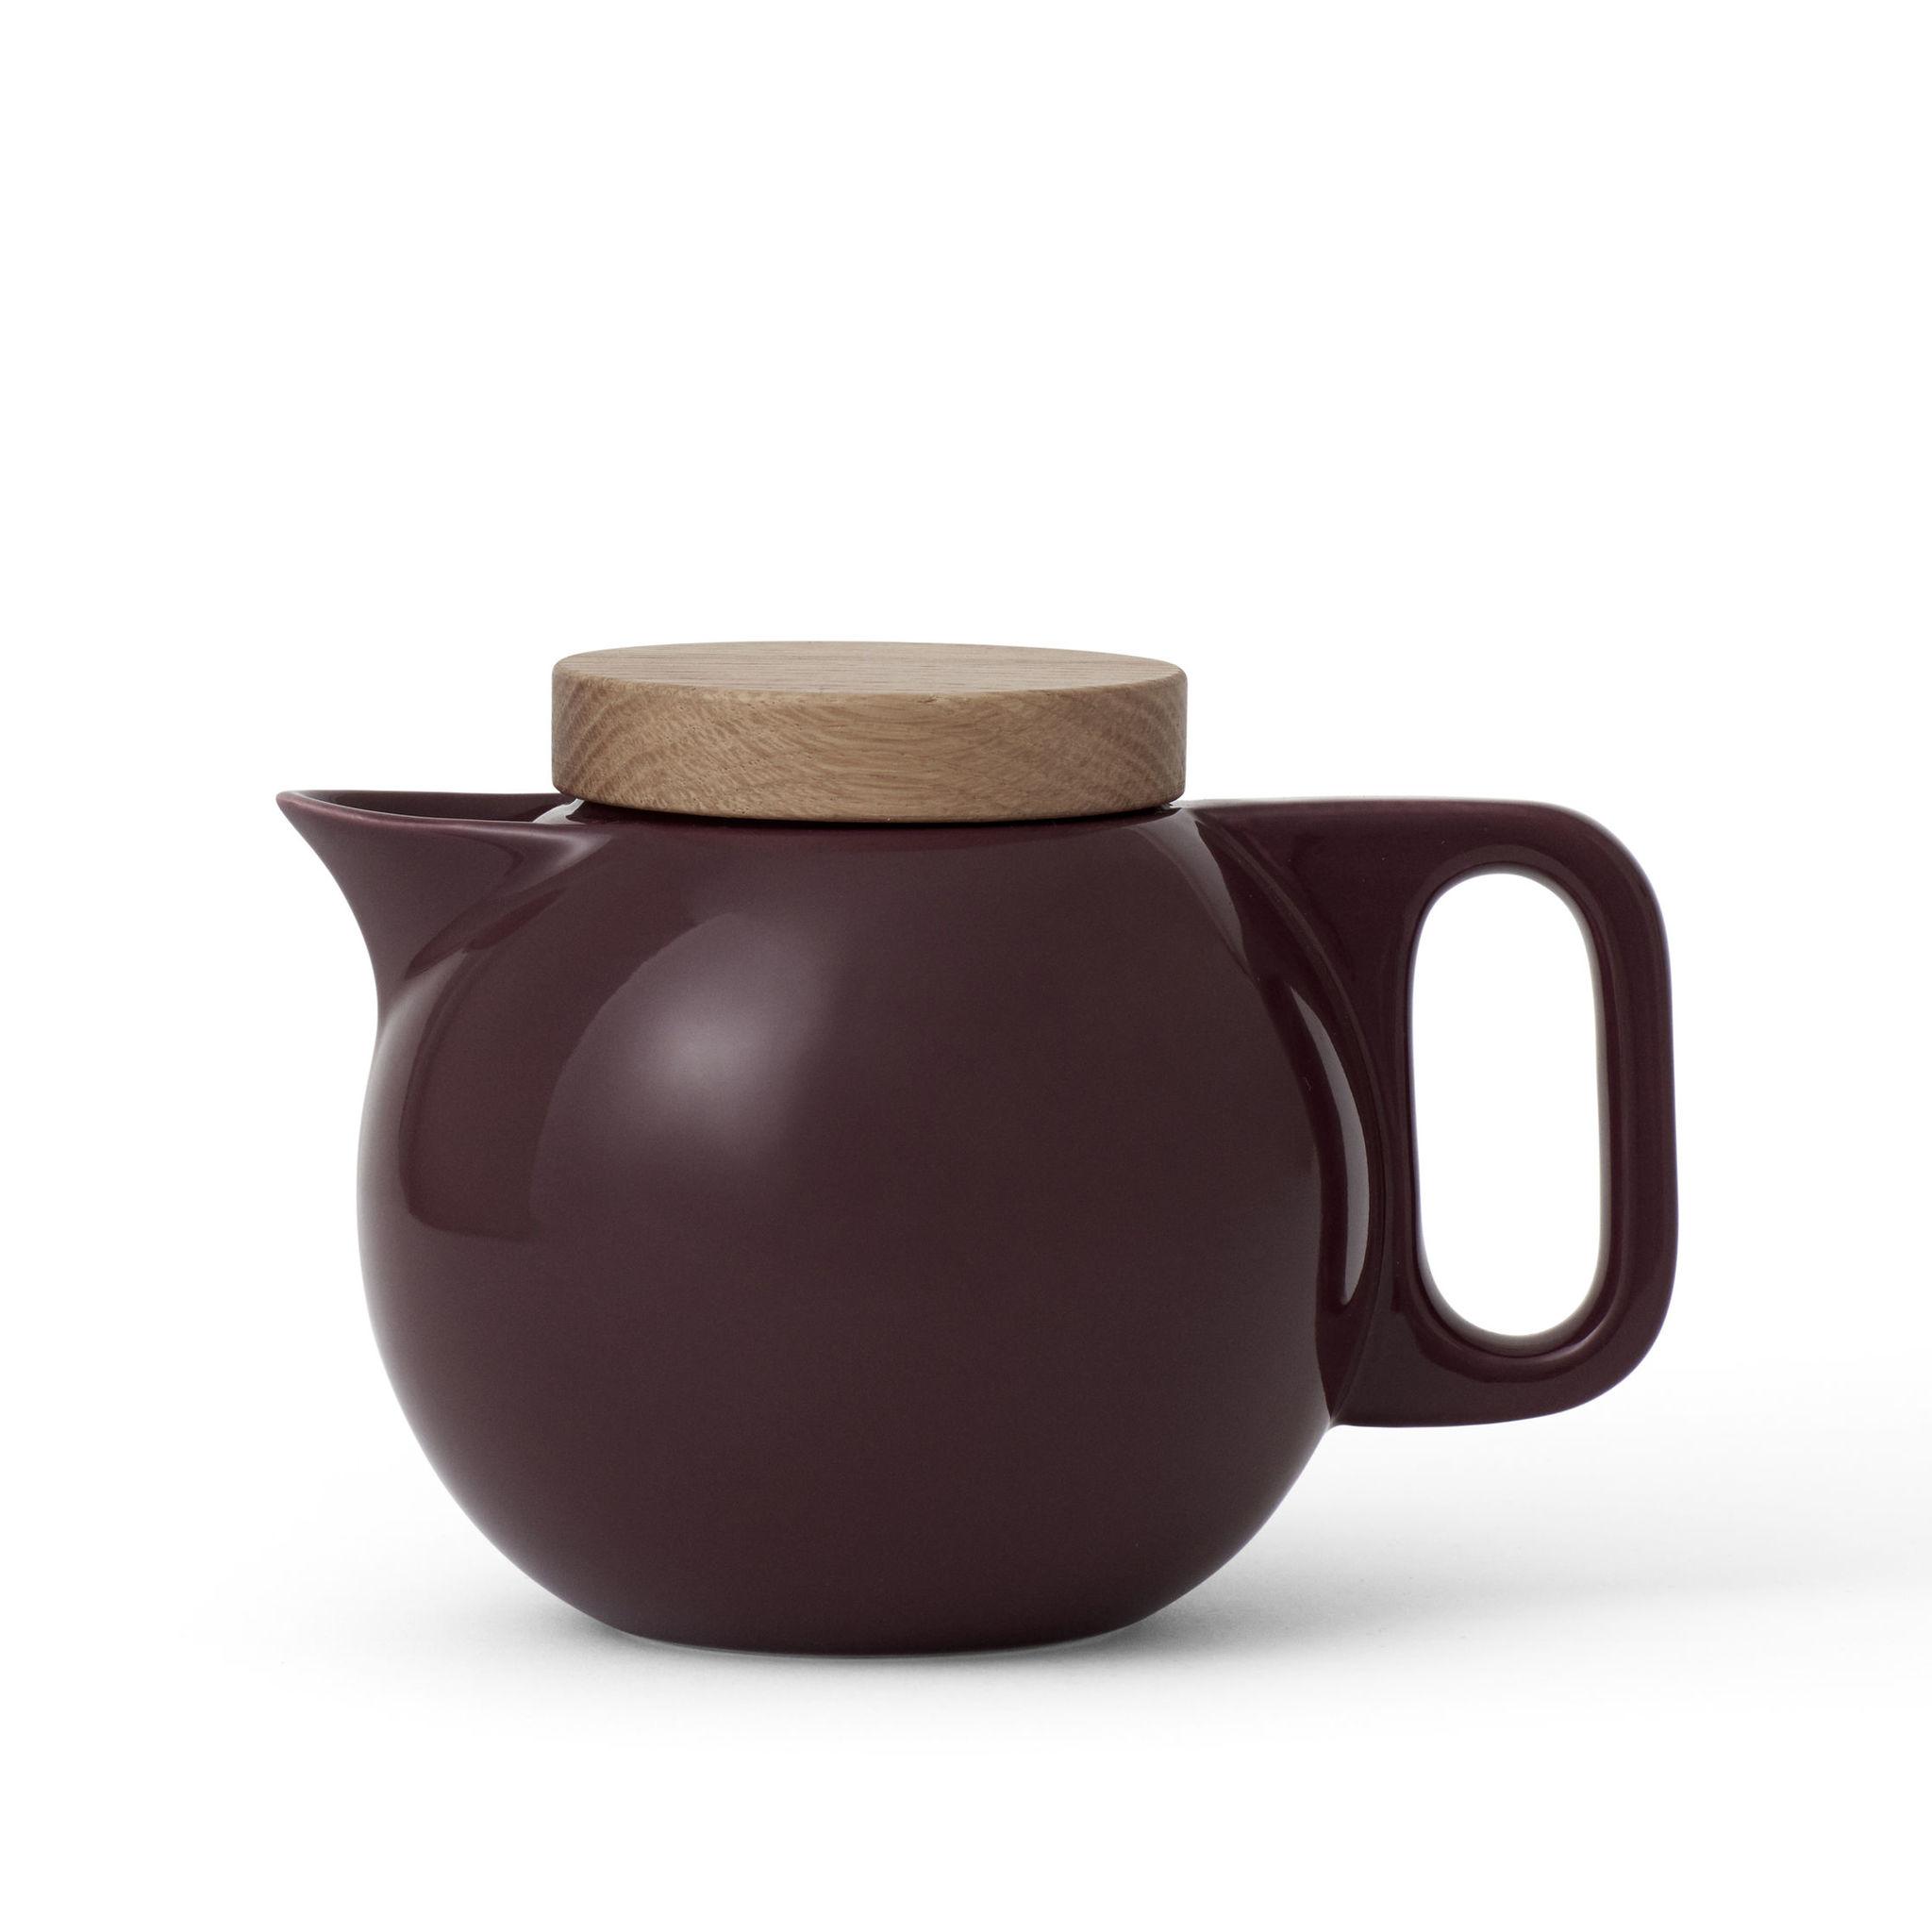 "Чайник заварочный с ситечком Viva Scandinavia ""Jaimi"" 650 мл"